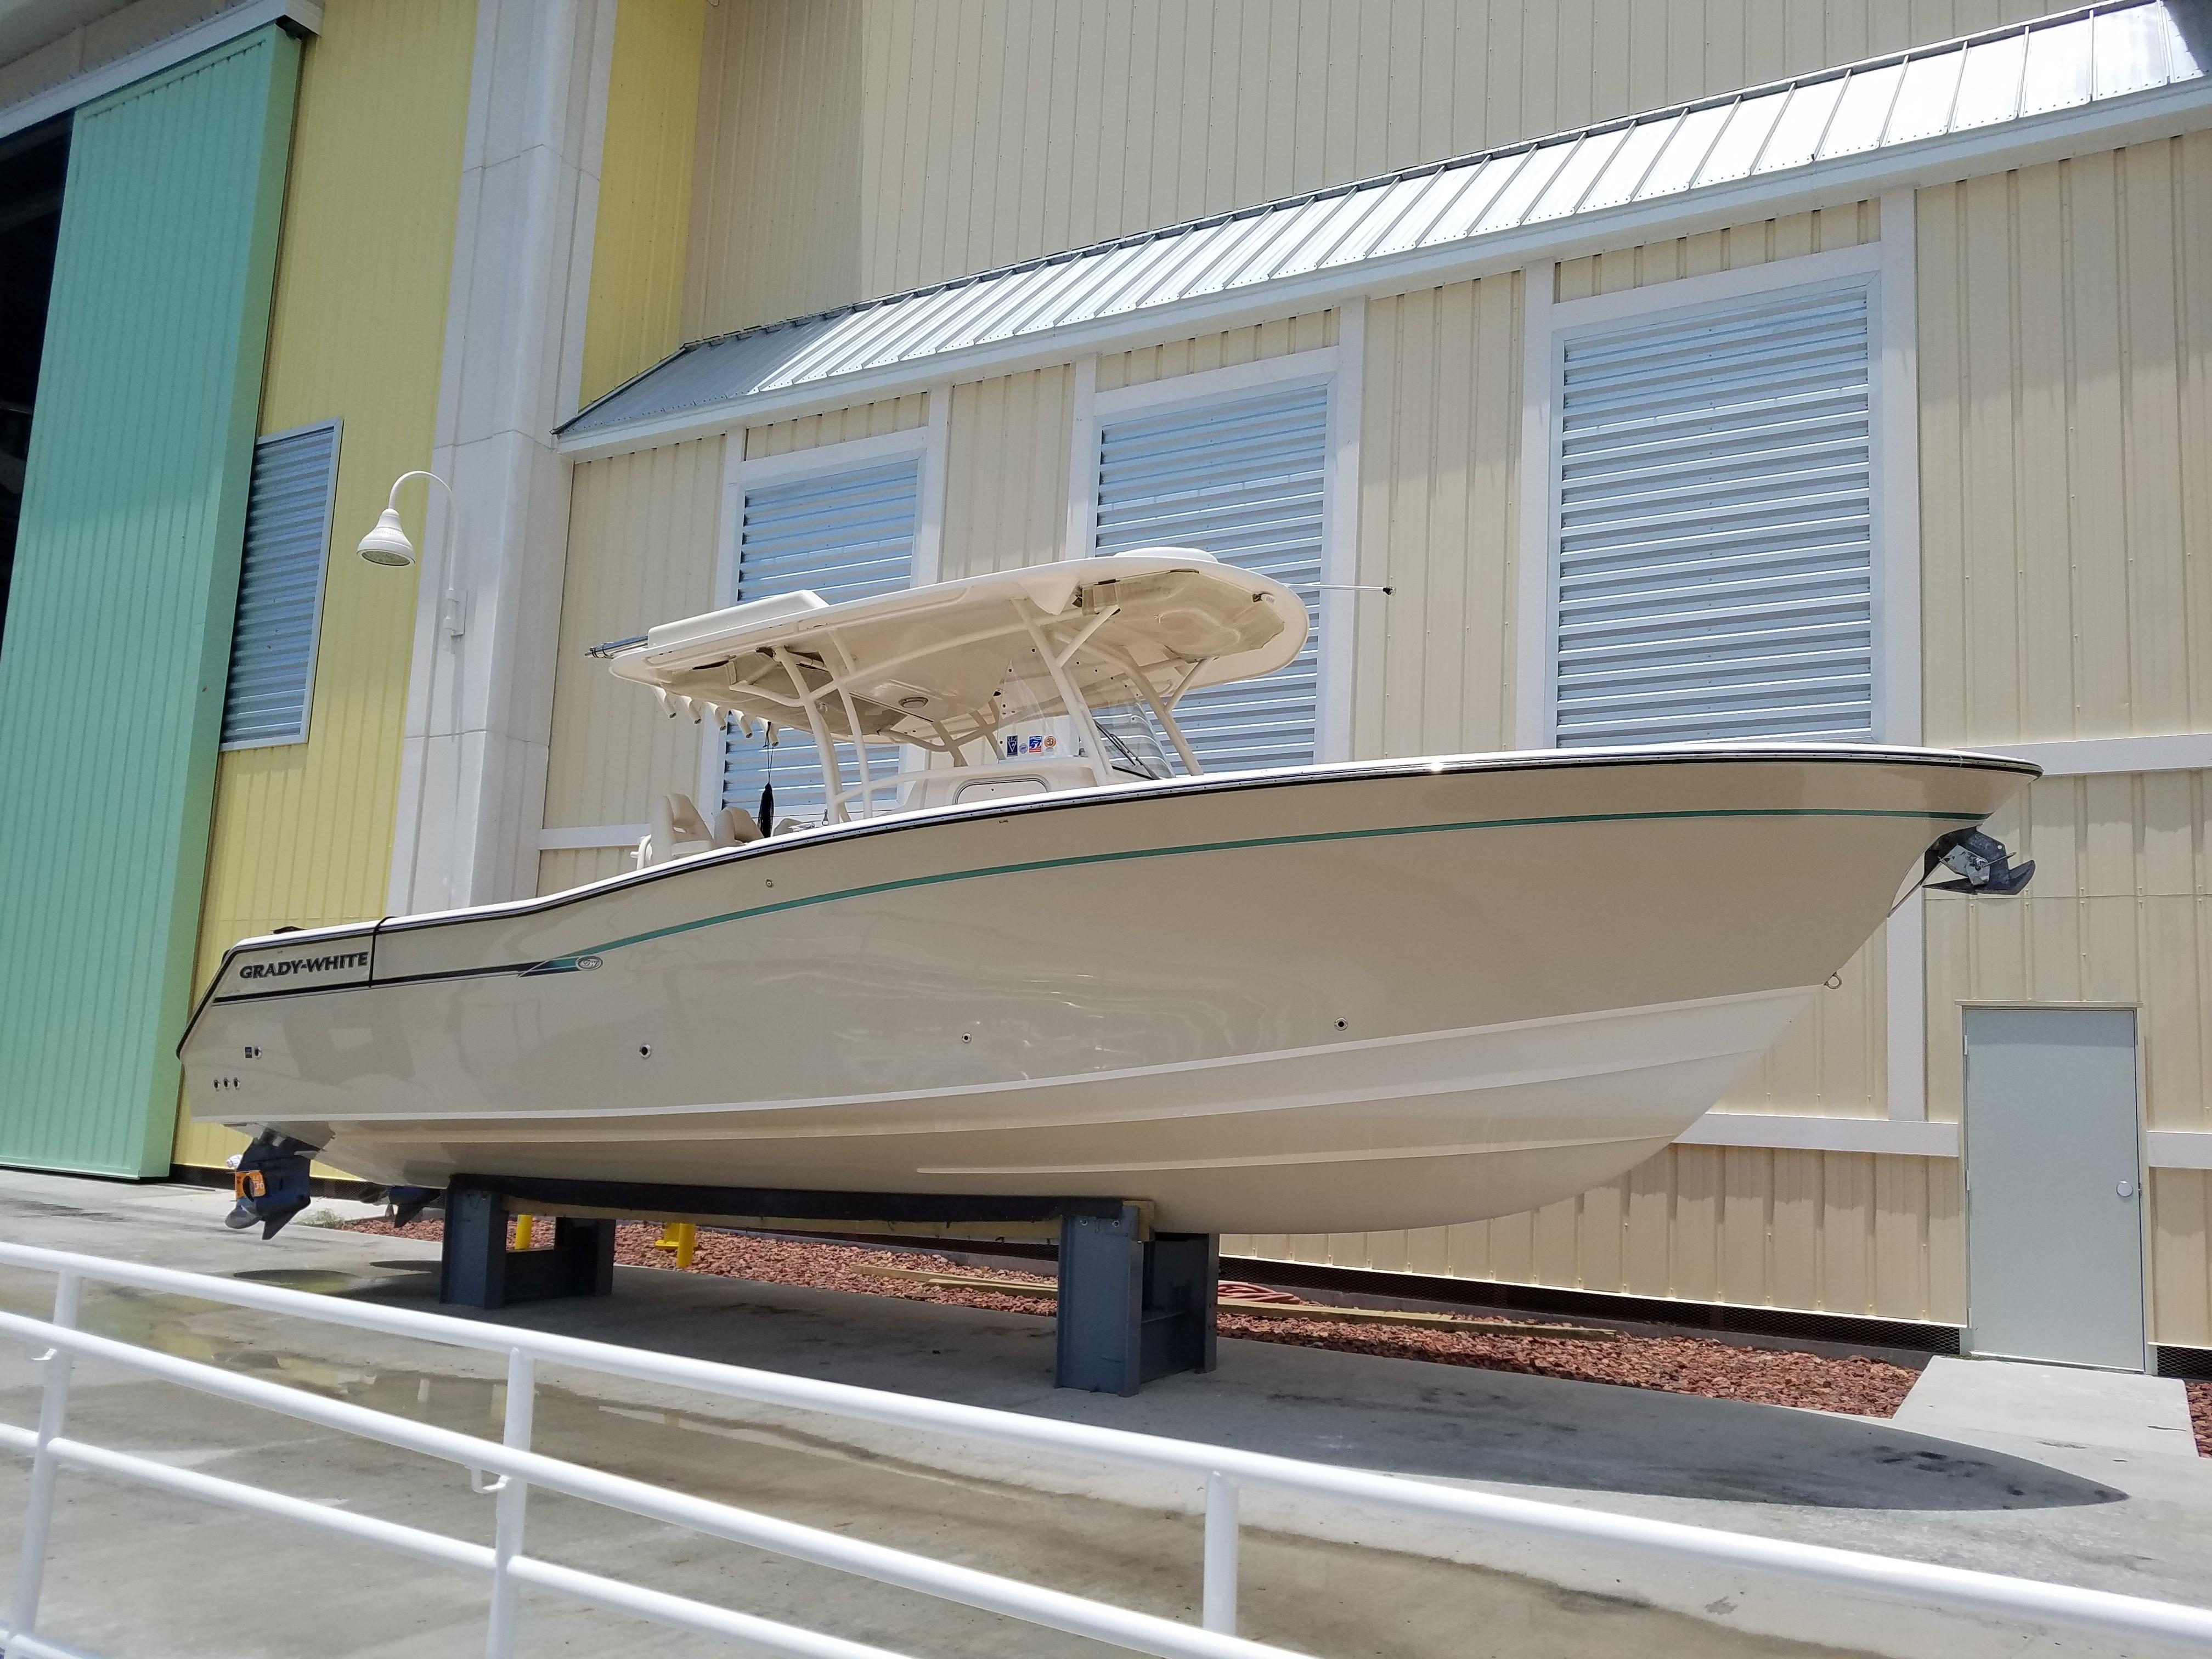 33 Grady-White 2015 Dunedin | Denison Yacht Sales